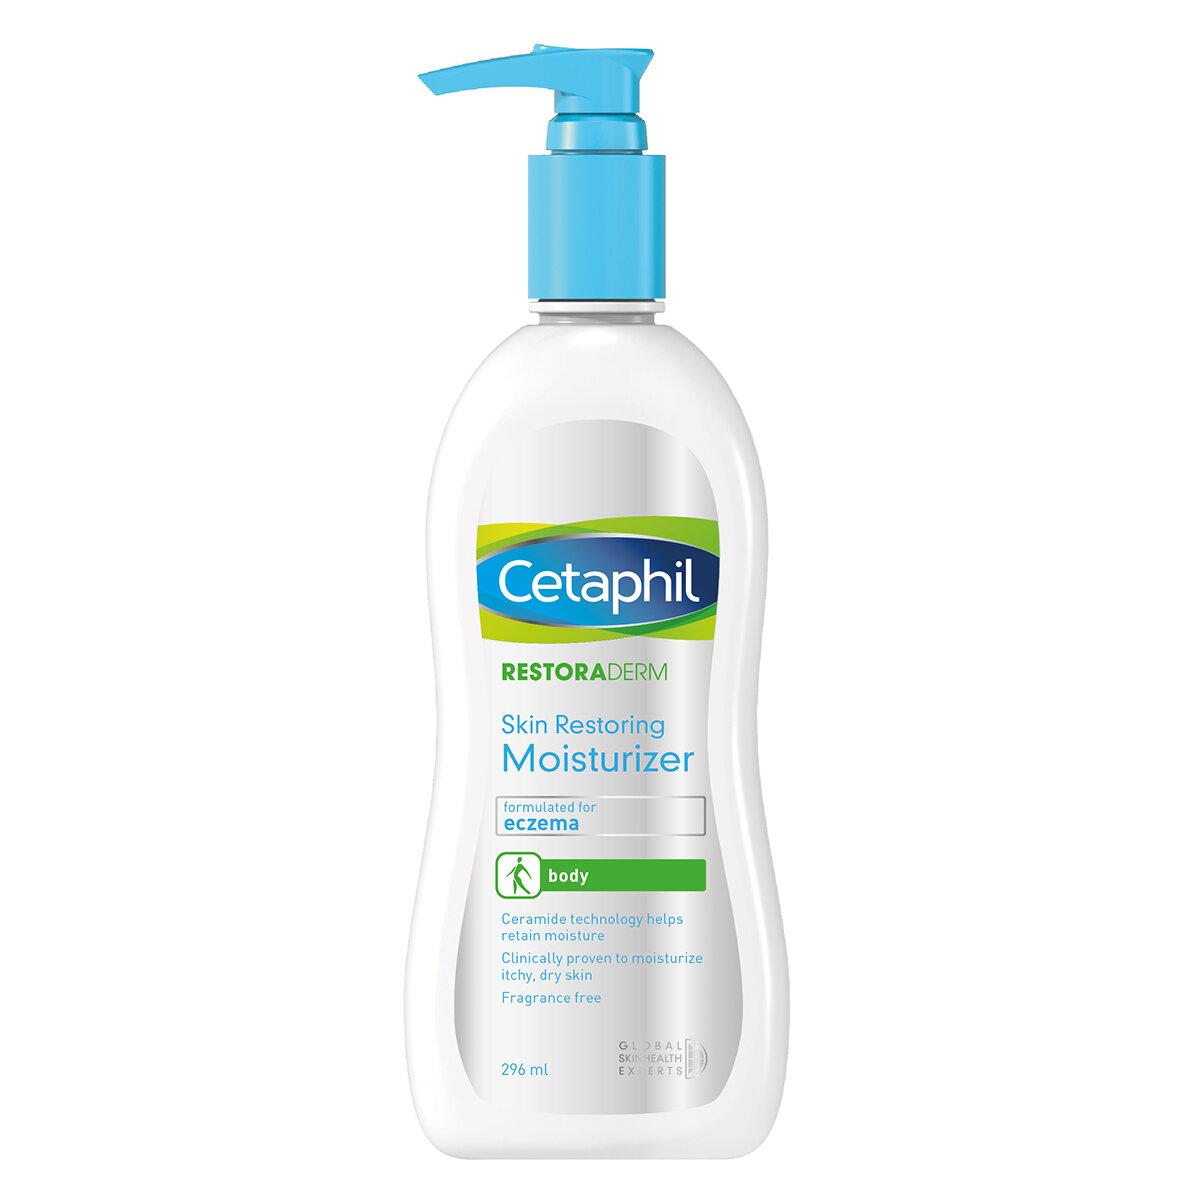 Review kem dưỡng điều trị viêm da Cetaphil Restoraderm  Eczema Skin Restoring Moisturizer